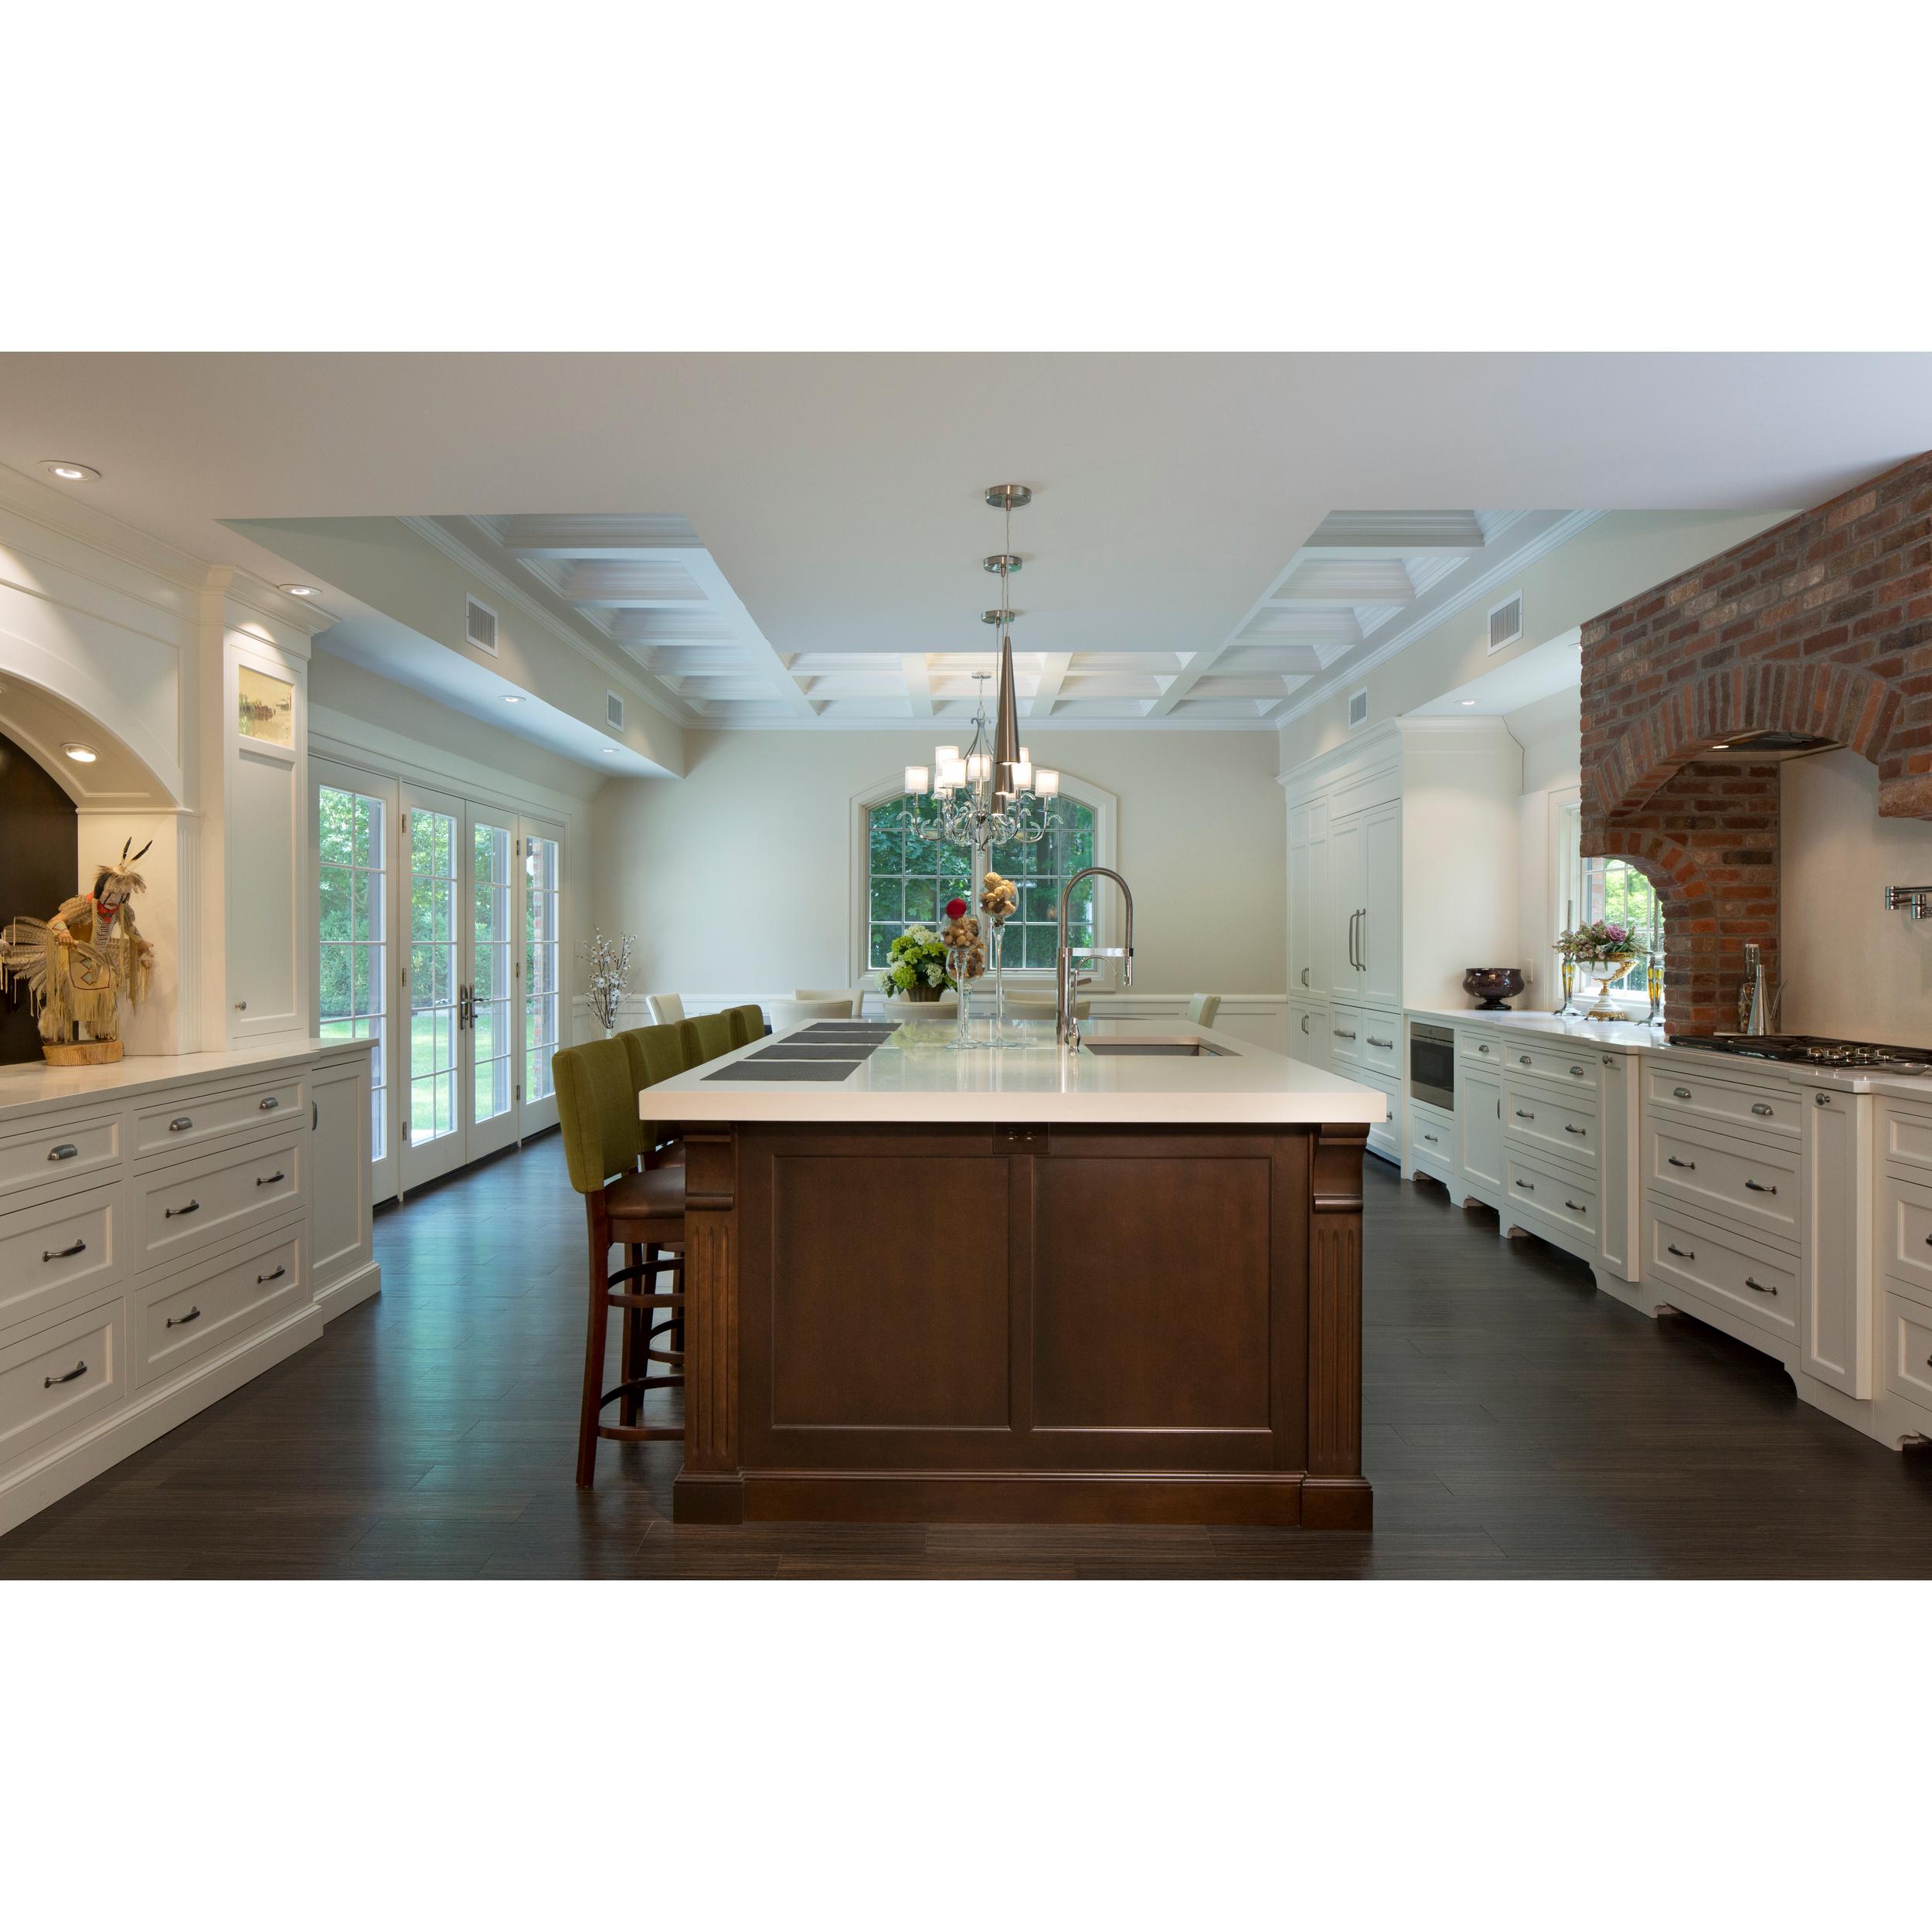 Elite Kitchen & Bath image 10